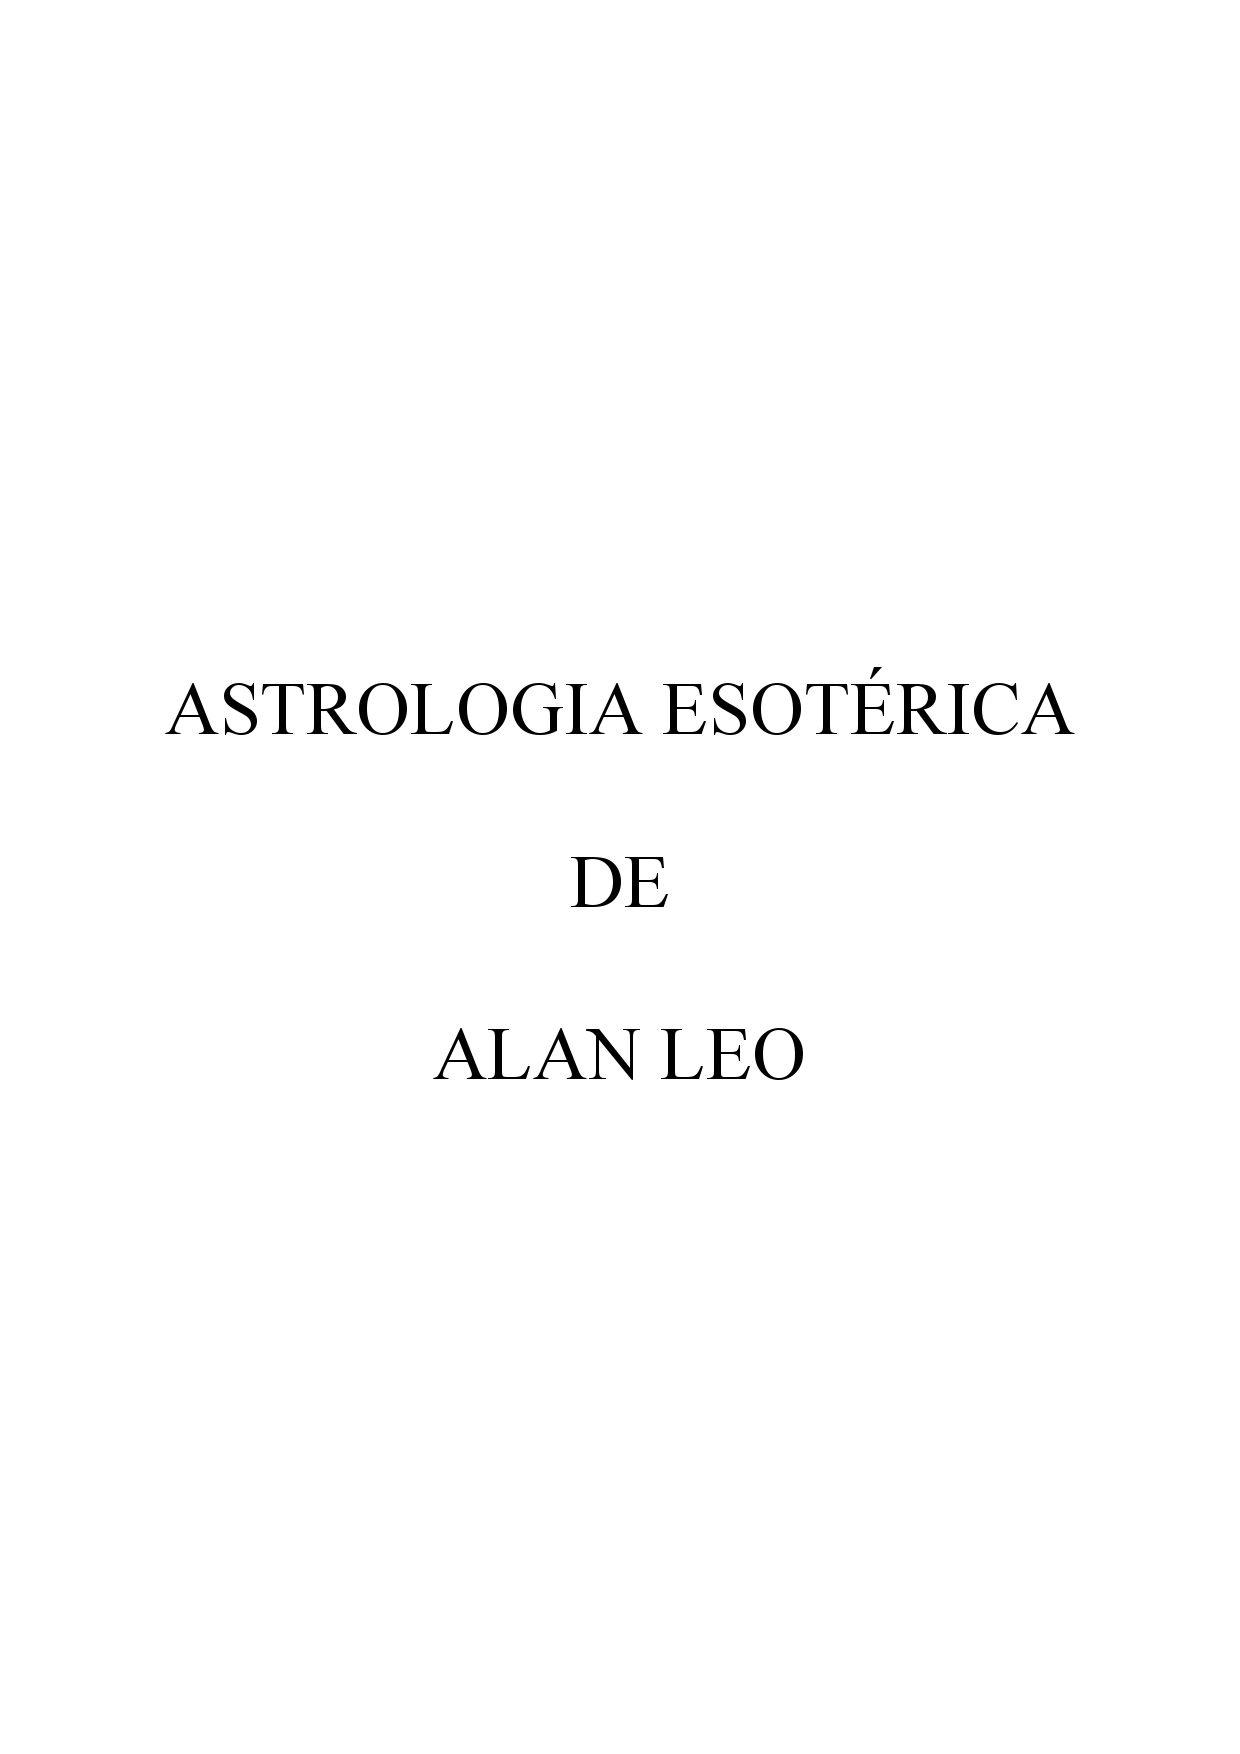 Microsoft Word - alanleoastroesote by Marco Tomaselli - issuu